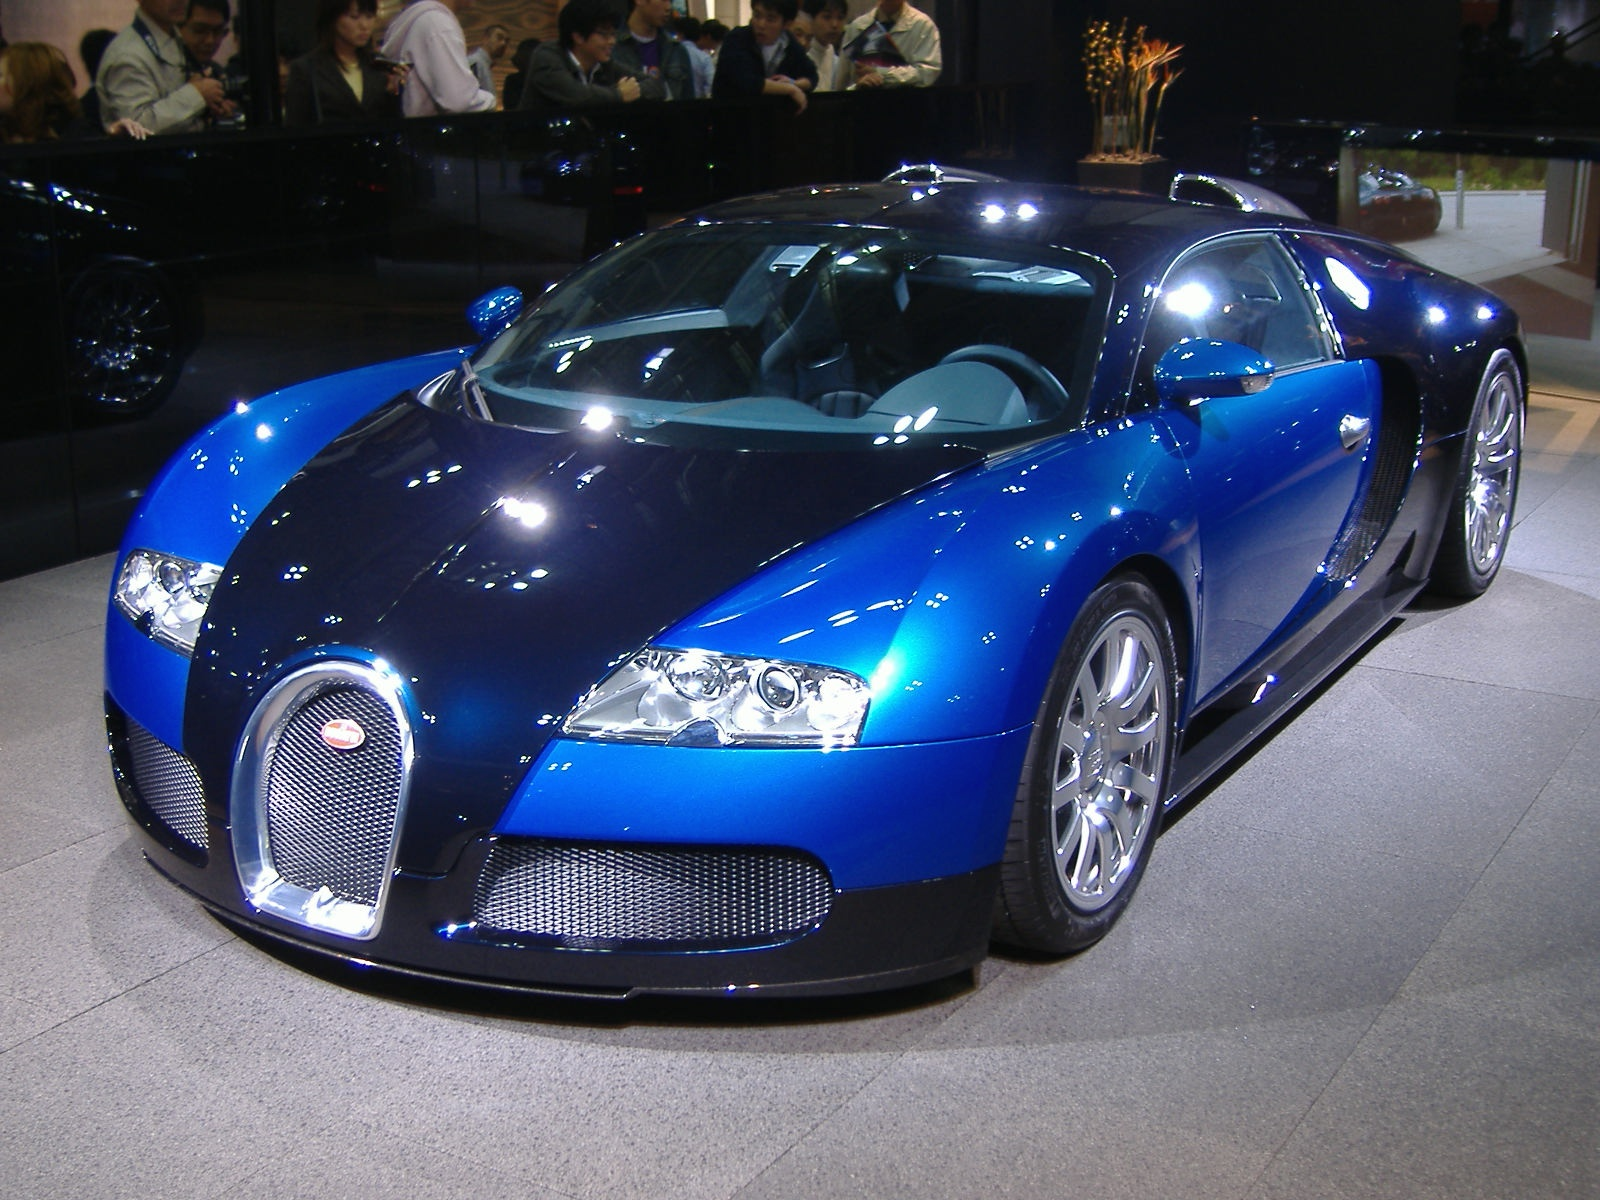 newsational bugatti veyron 16 4 world 39 s fastest and a super car. Black Bedroom Furniture Sets. Home Design Ideas